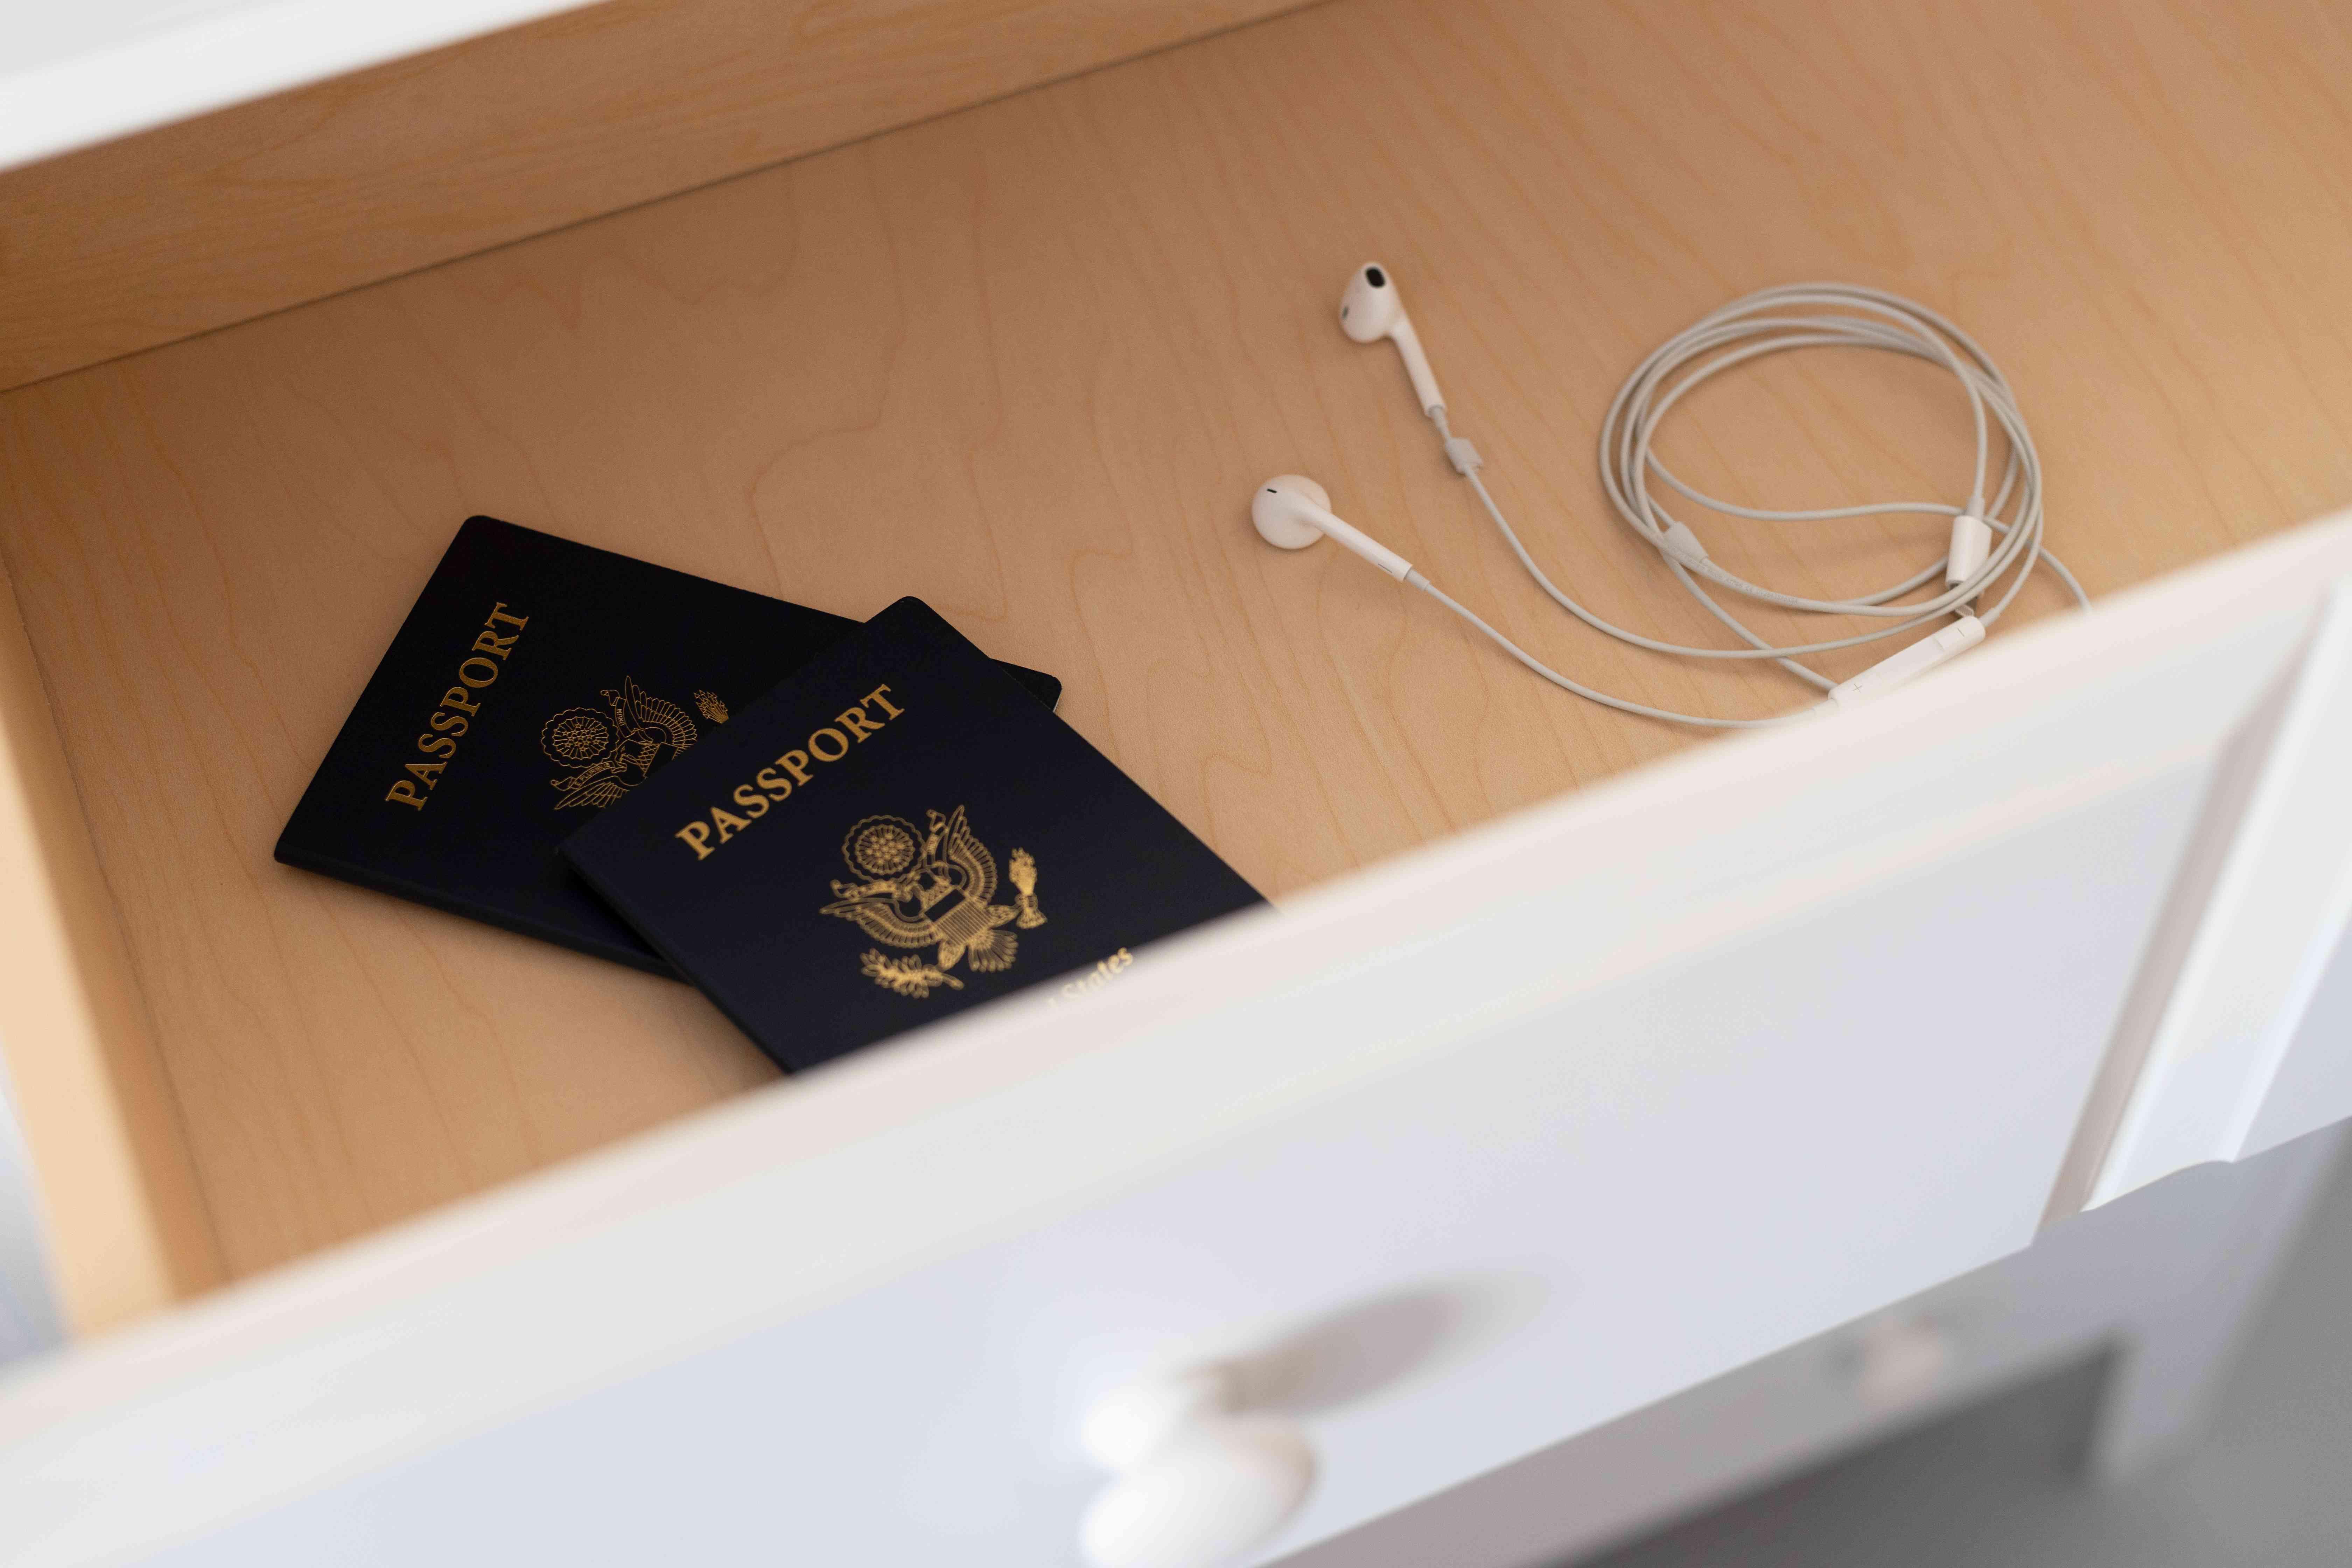 Passport documents and headphones in empty drawer